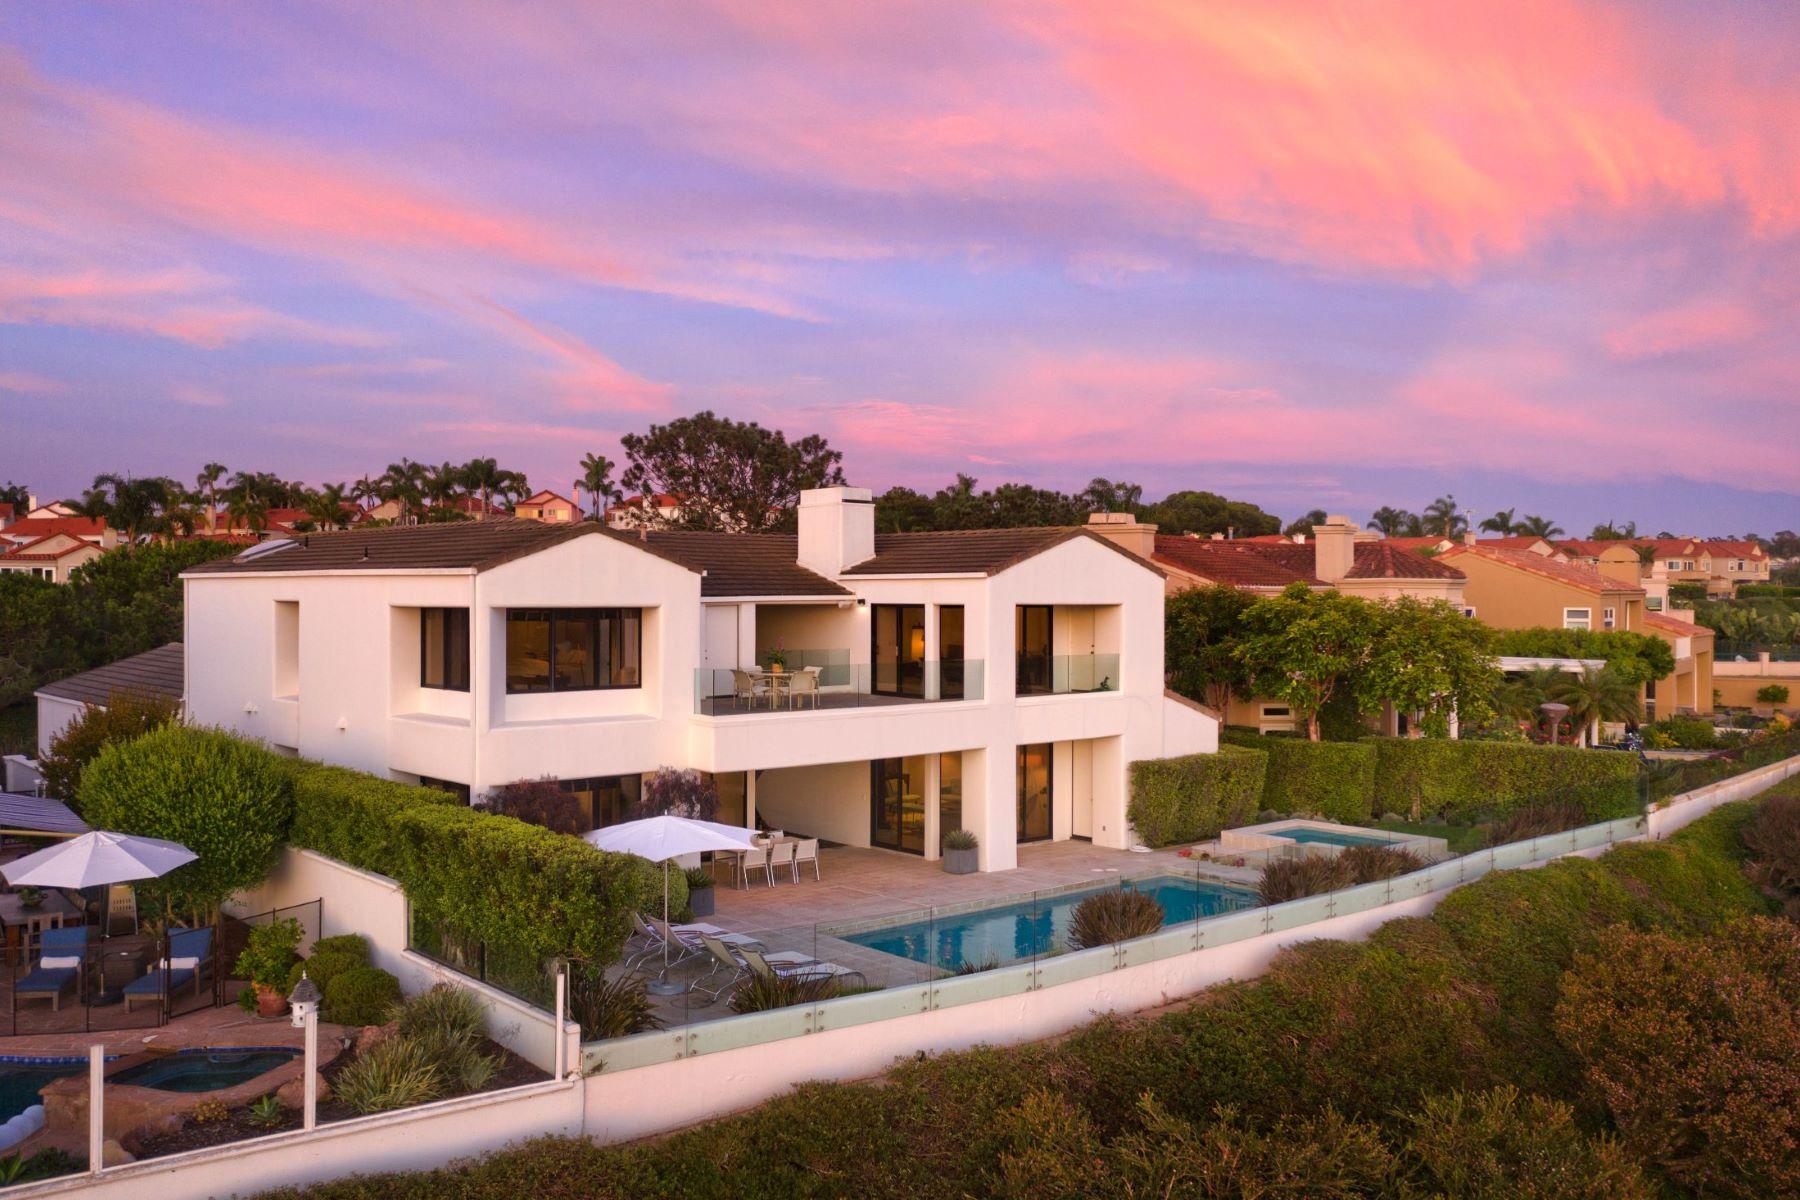 Single Family Homes for Sale at 27 Gavina Dana Point, California 92629 United States